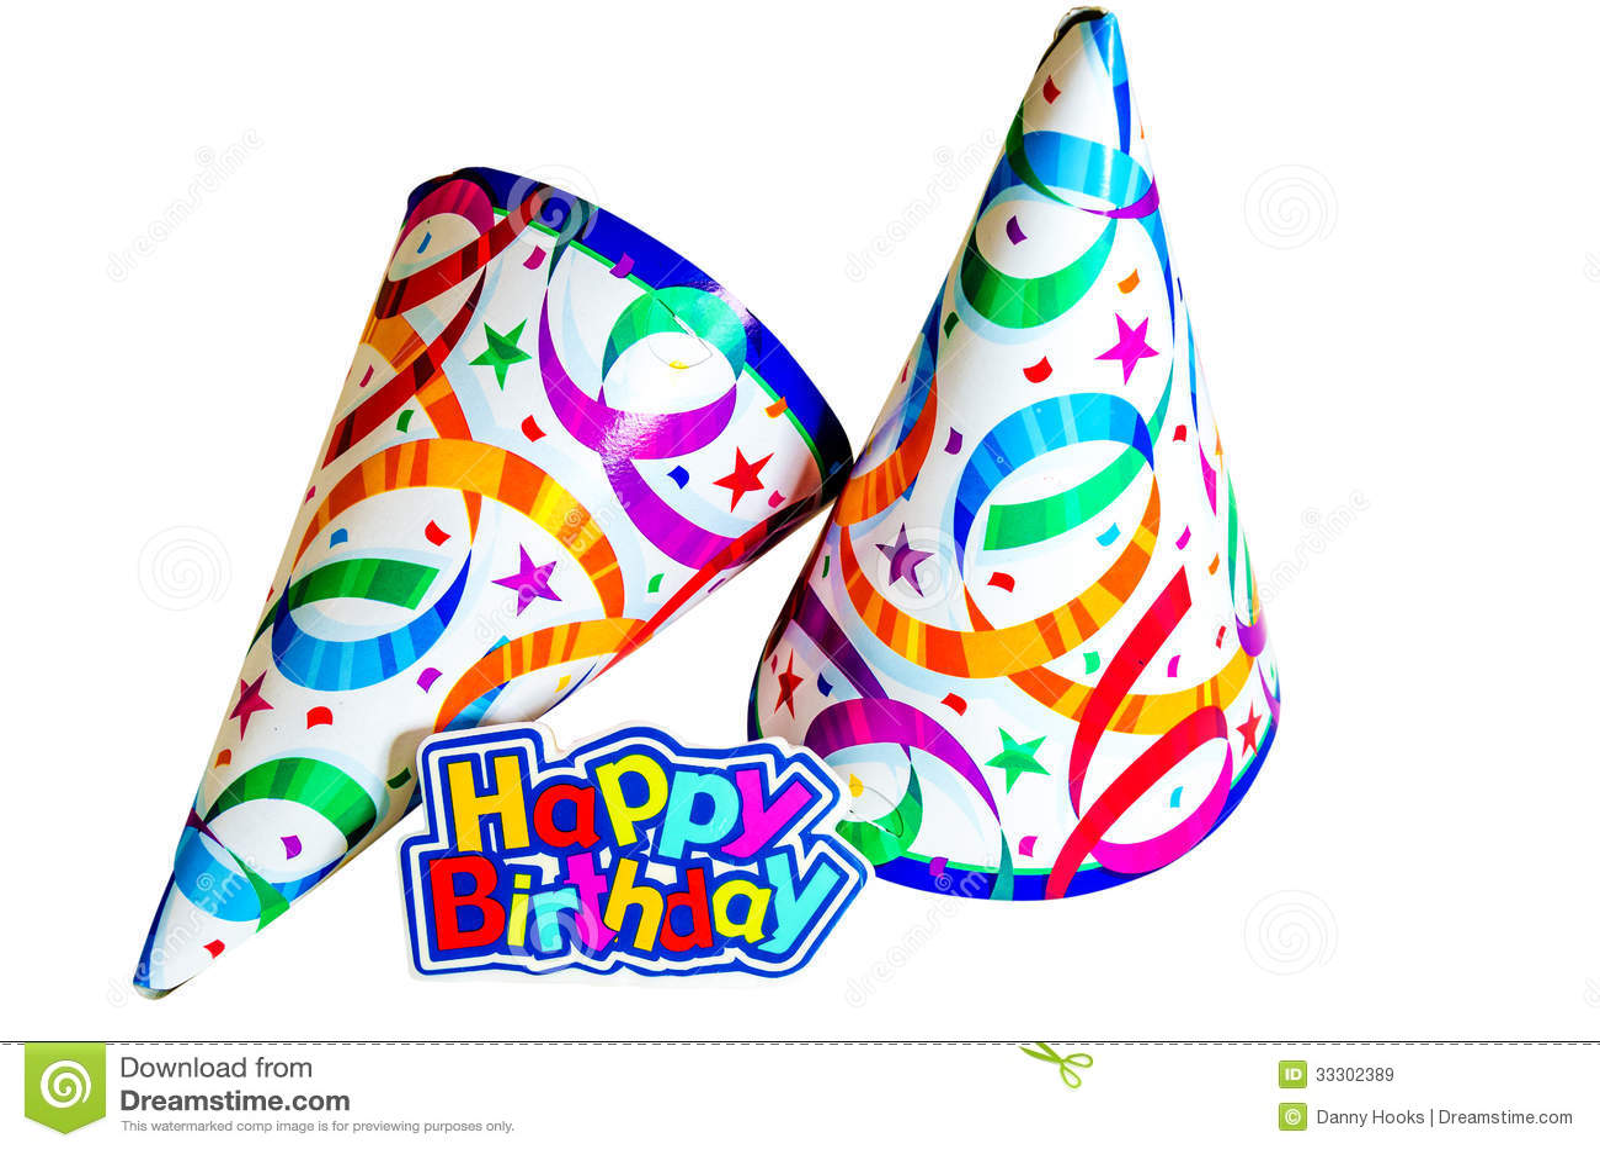 Wonderbaar Happy Birthday with Hats stock image. Image of festive - 33302389 TL-96